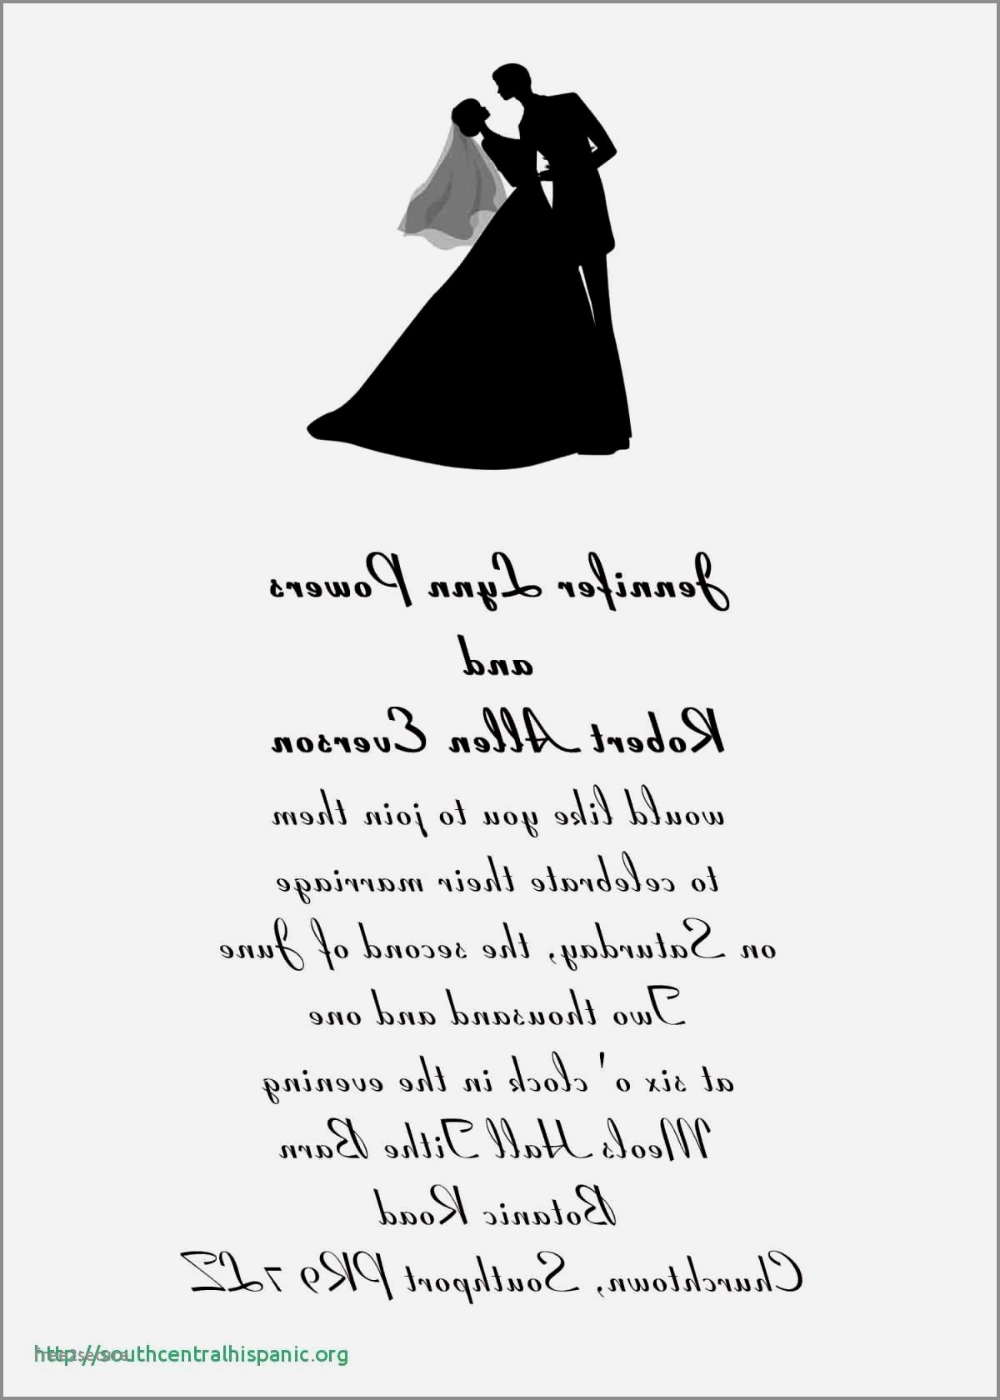 Black And White Formal Wedding Invitations Elegant Invitation For Wedding Inspirational Bride Groom Invitation